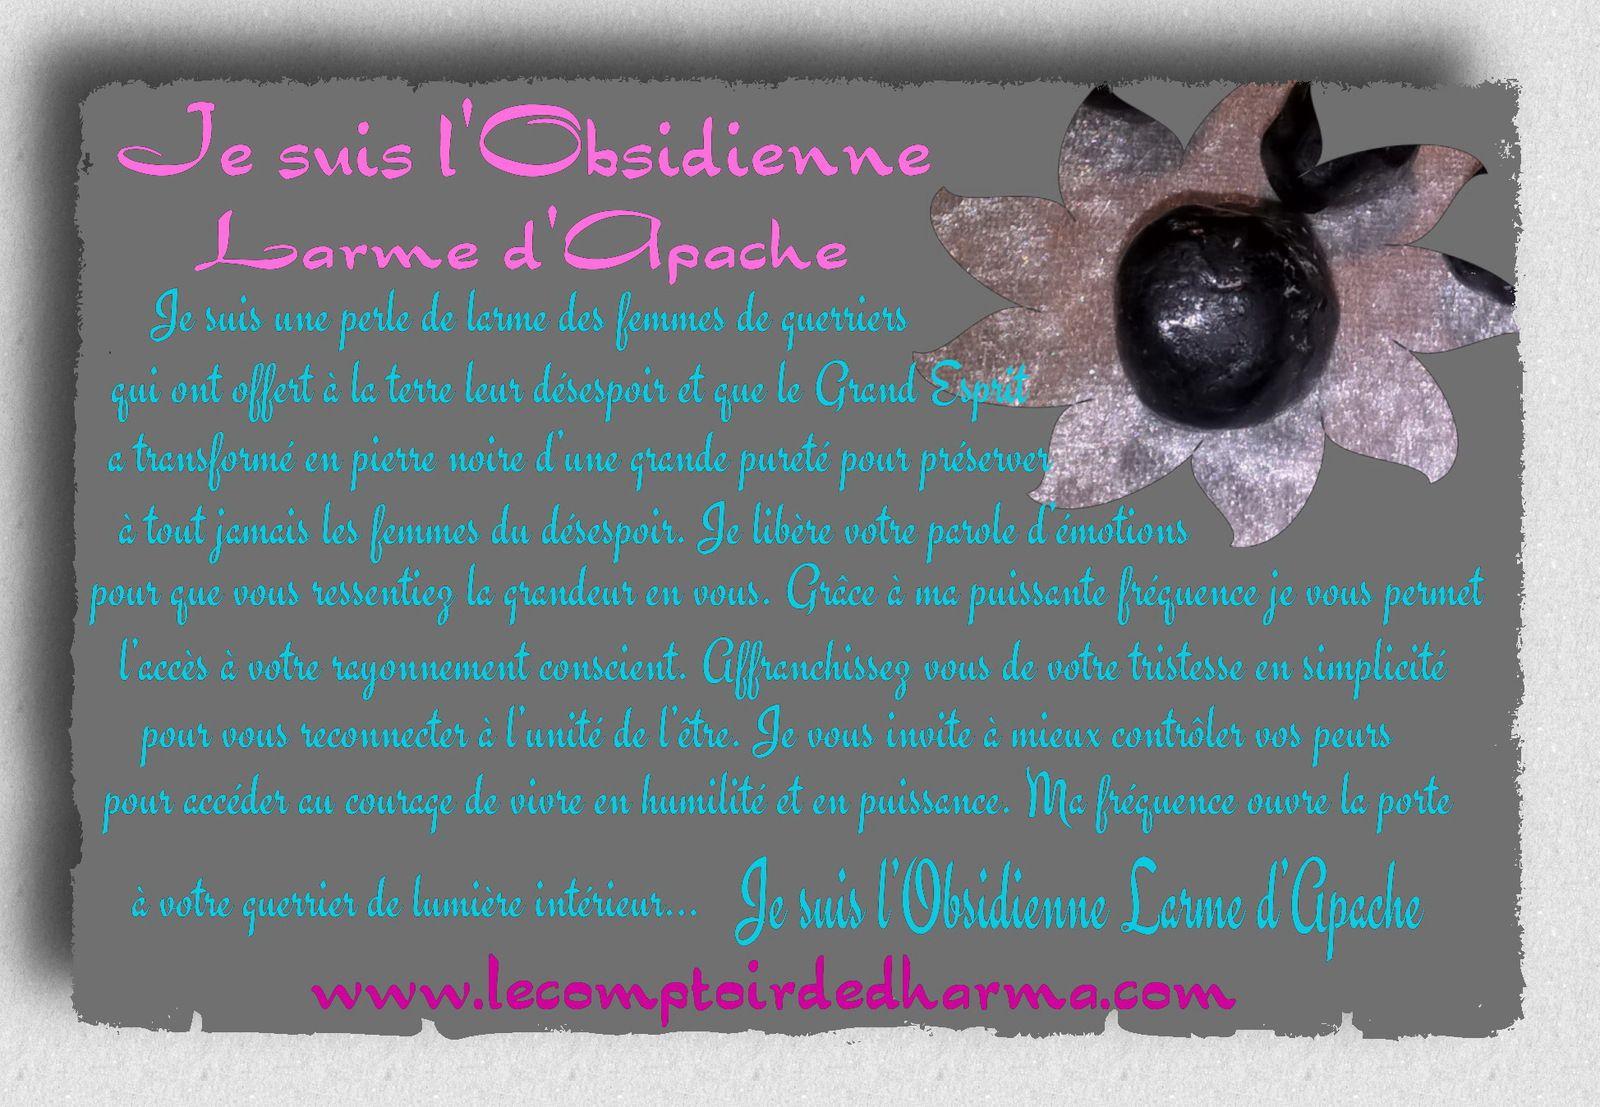 L'Obsidienne Larme d'Apache